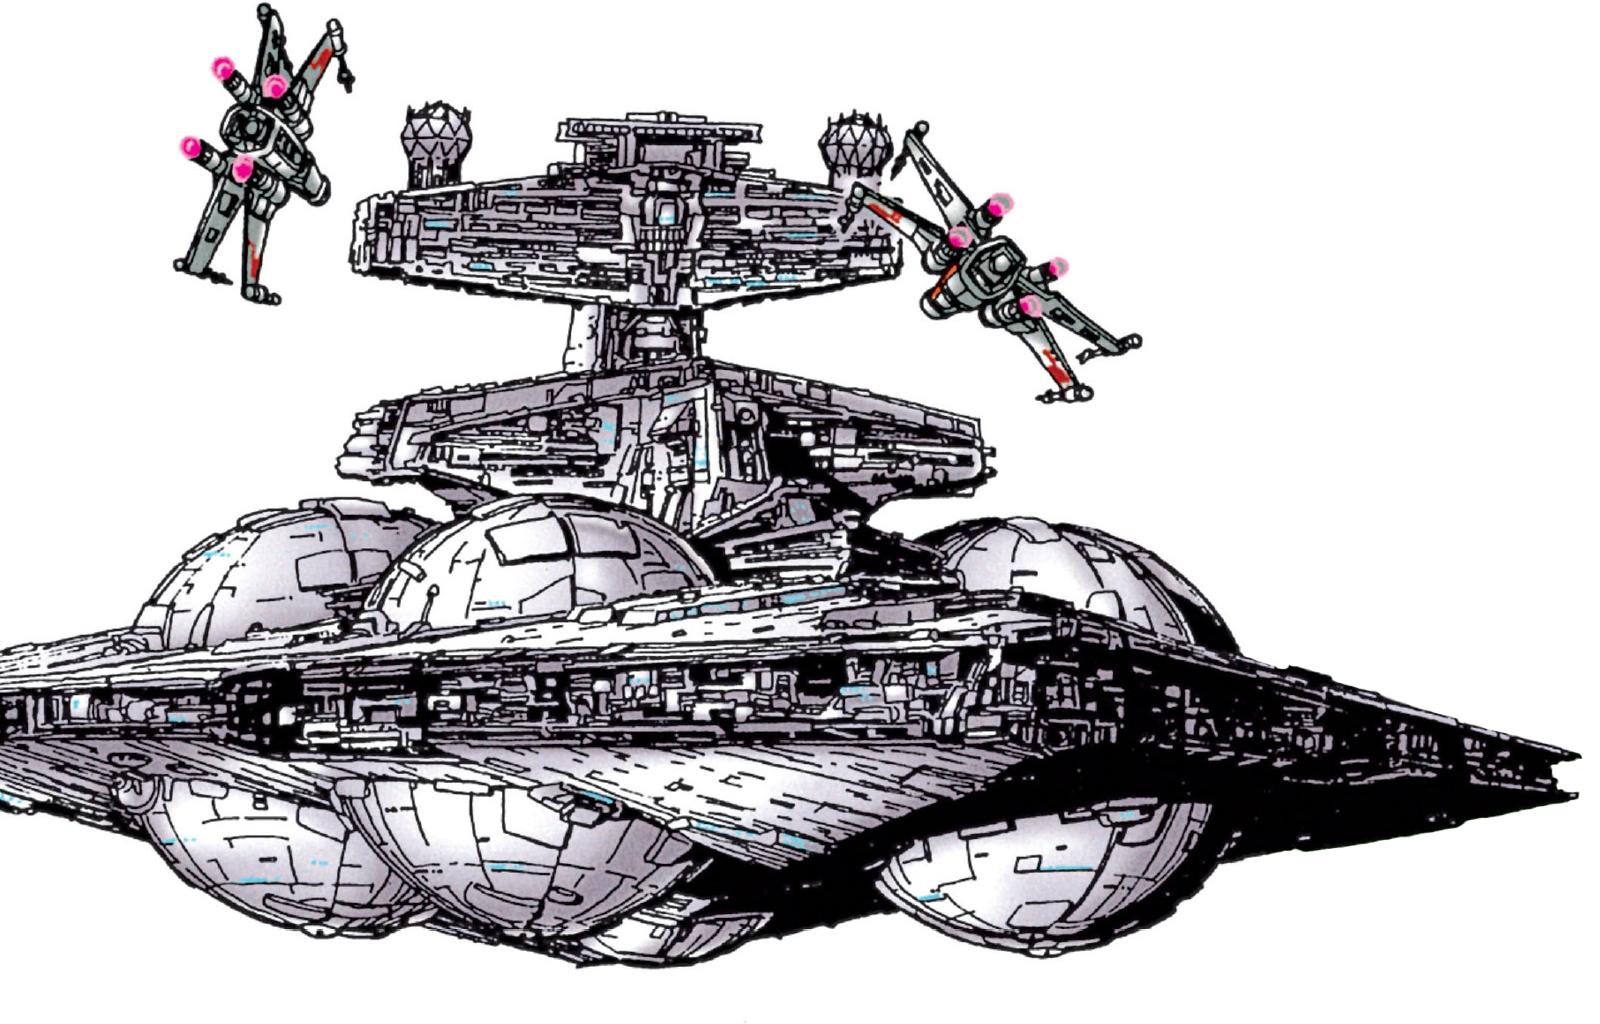 Interdictor-class Star Destroyer | Wookieepedia | FANDOM